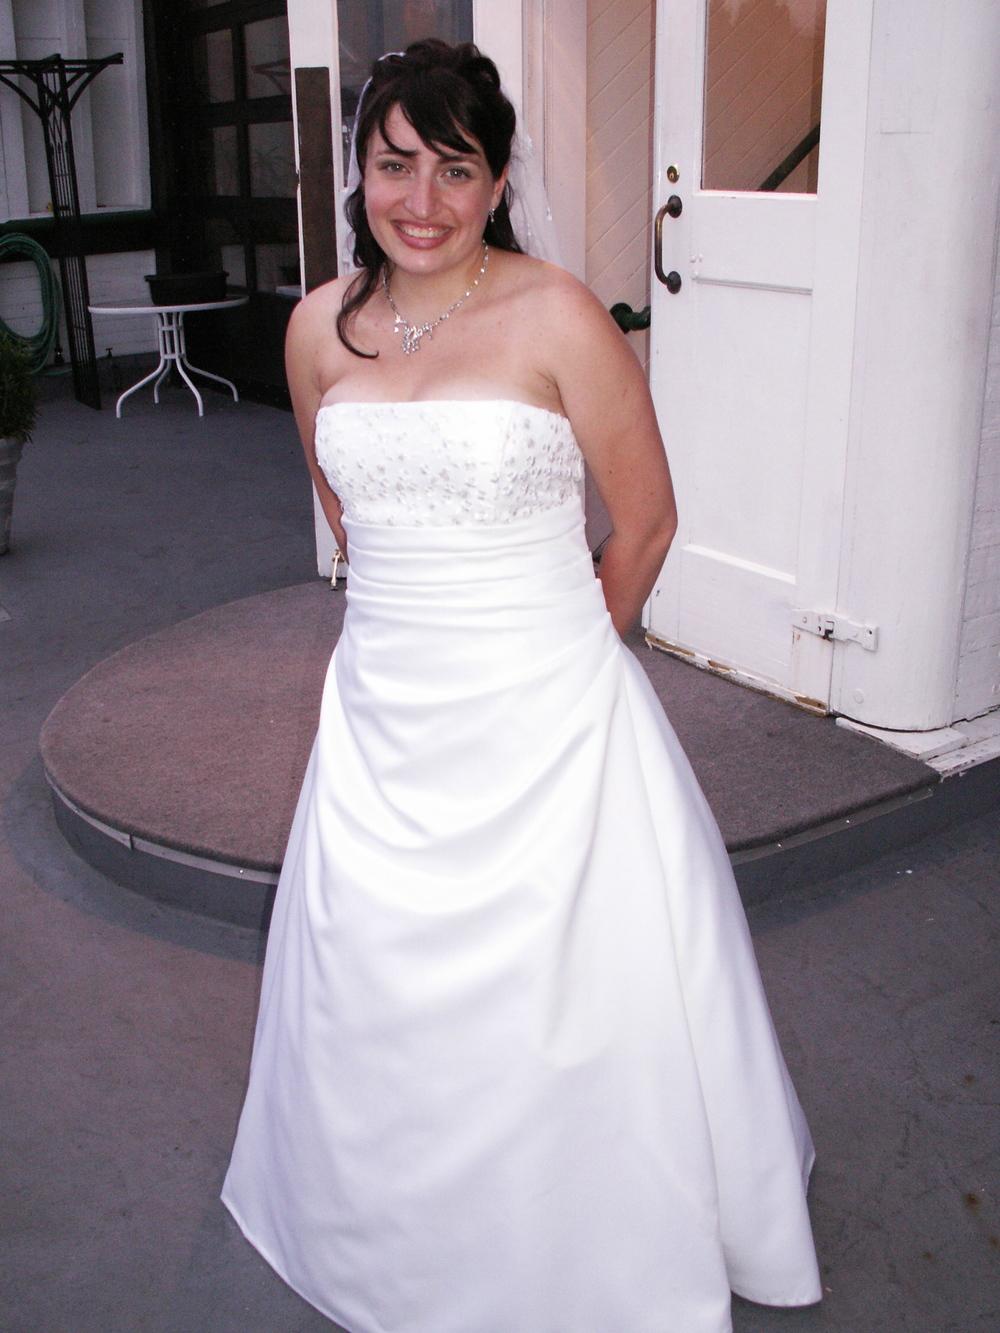 Liz's Wedding Dress  Made by Allison Dawe